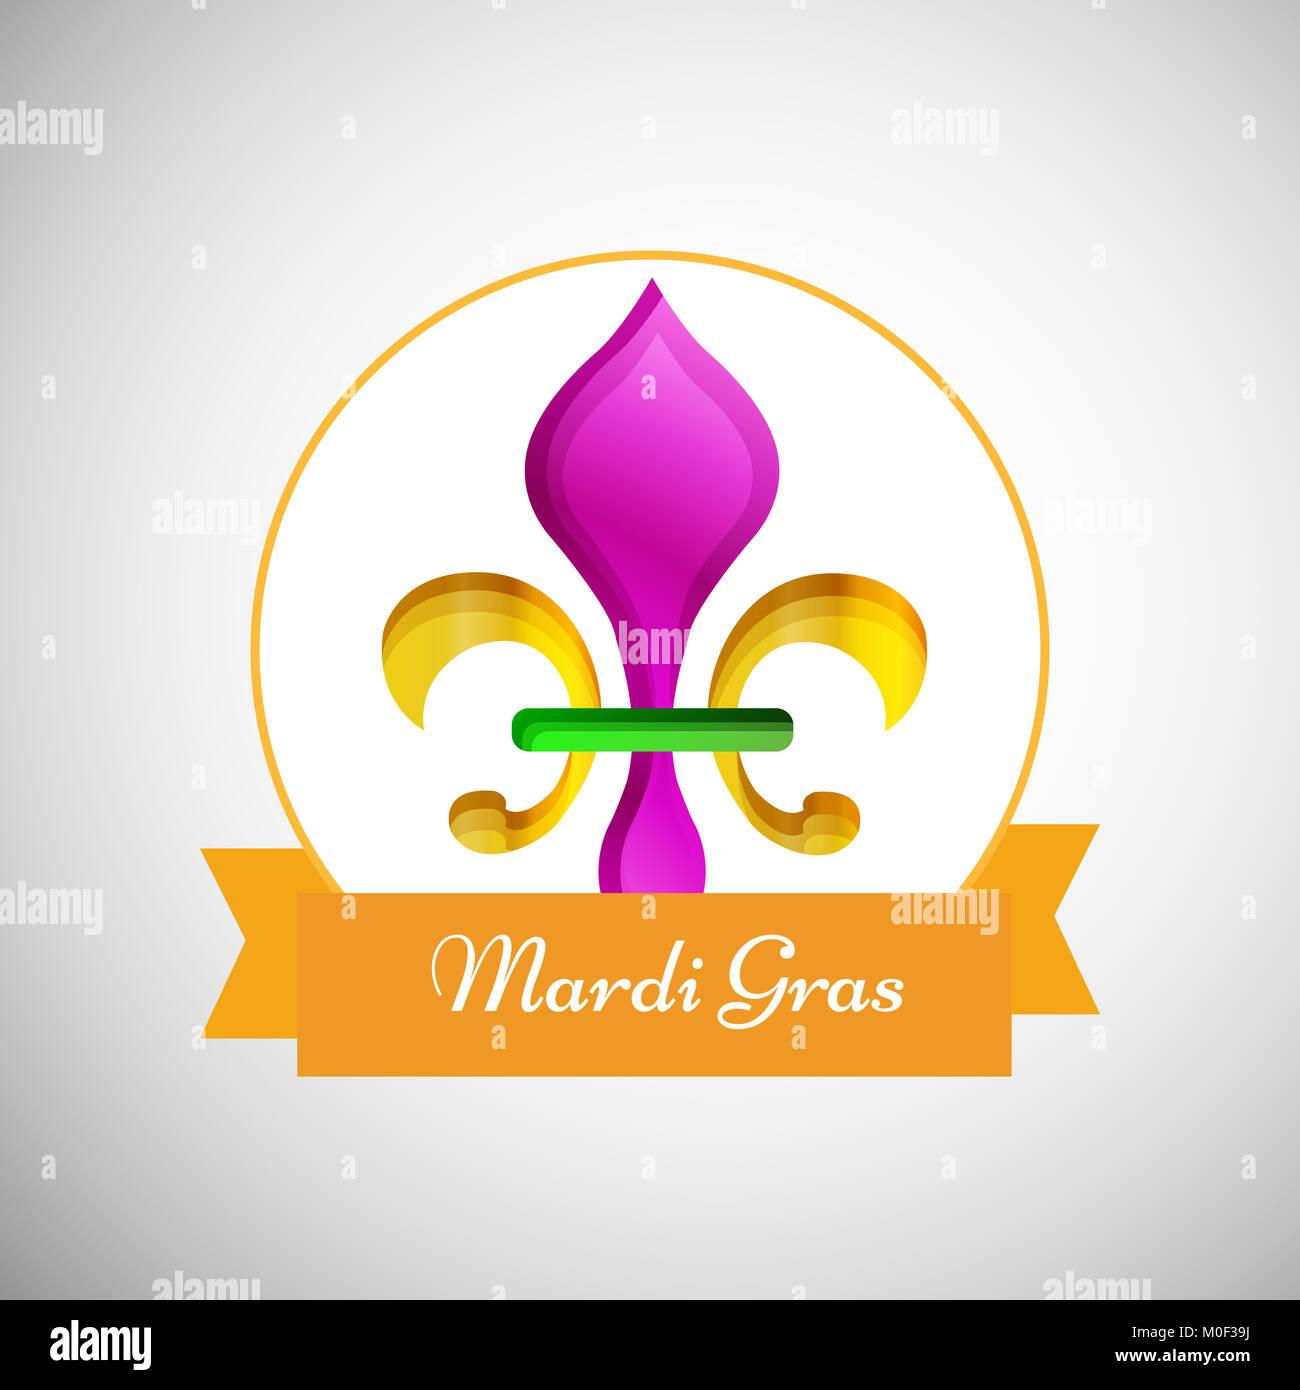 Mardi Gras Jester Hat Stock Photos Mardi Gras Jester Hat Stock